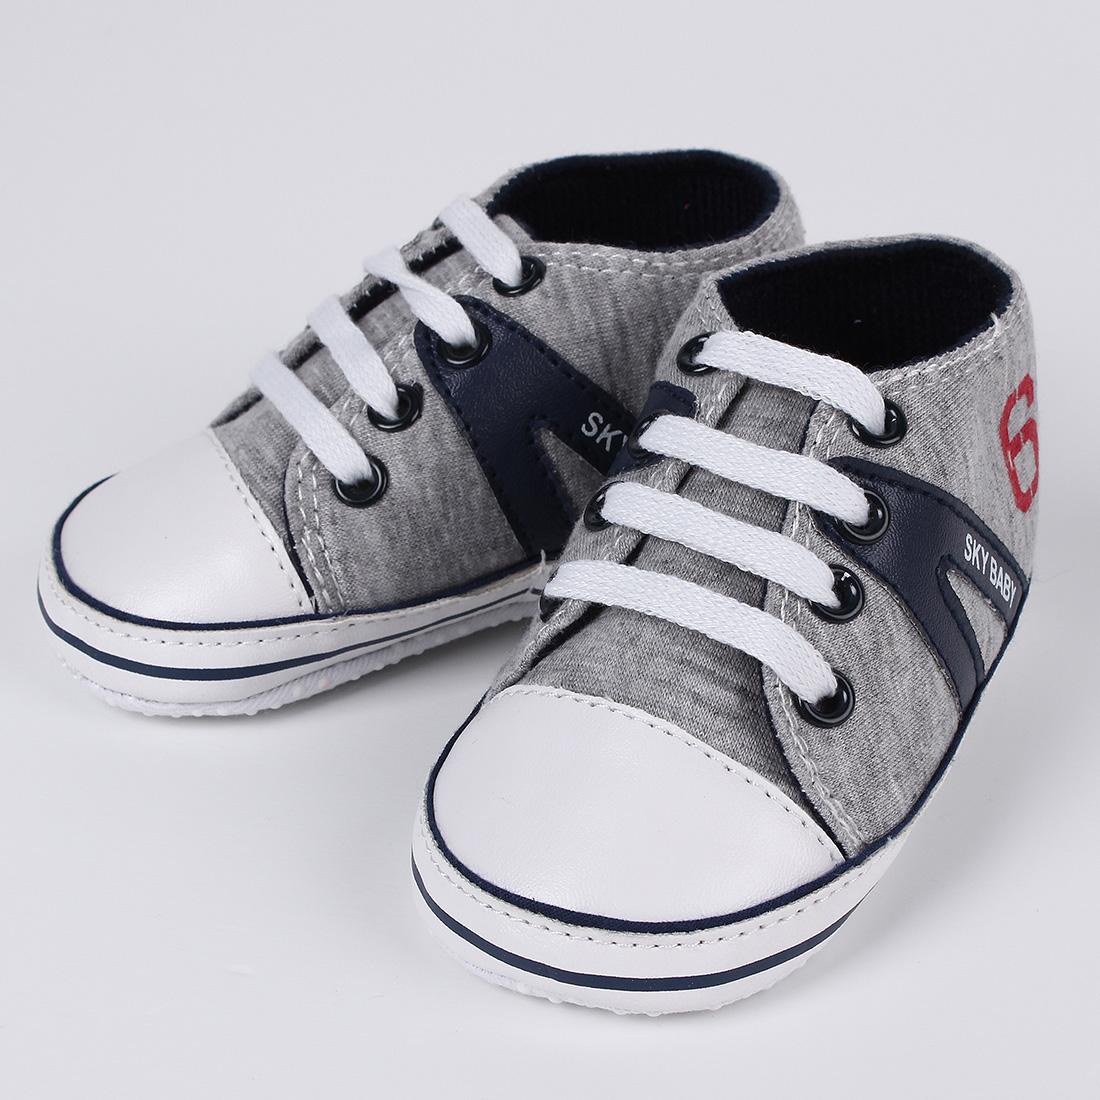 0-18 Months Cute Infant Toddler Baby Shoes Girl Boy Soft Sole Sneaker 11-13cm Prewalker First Walker Crib Kids & Mothercar(China (Mainland))